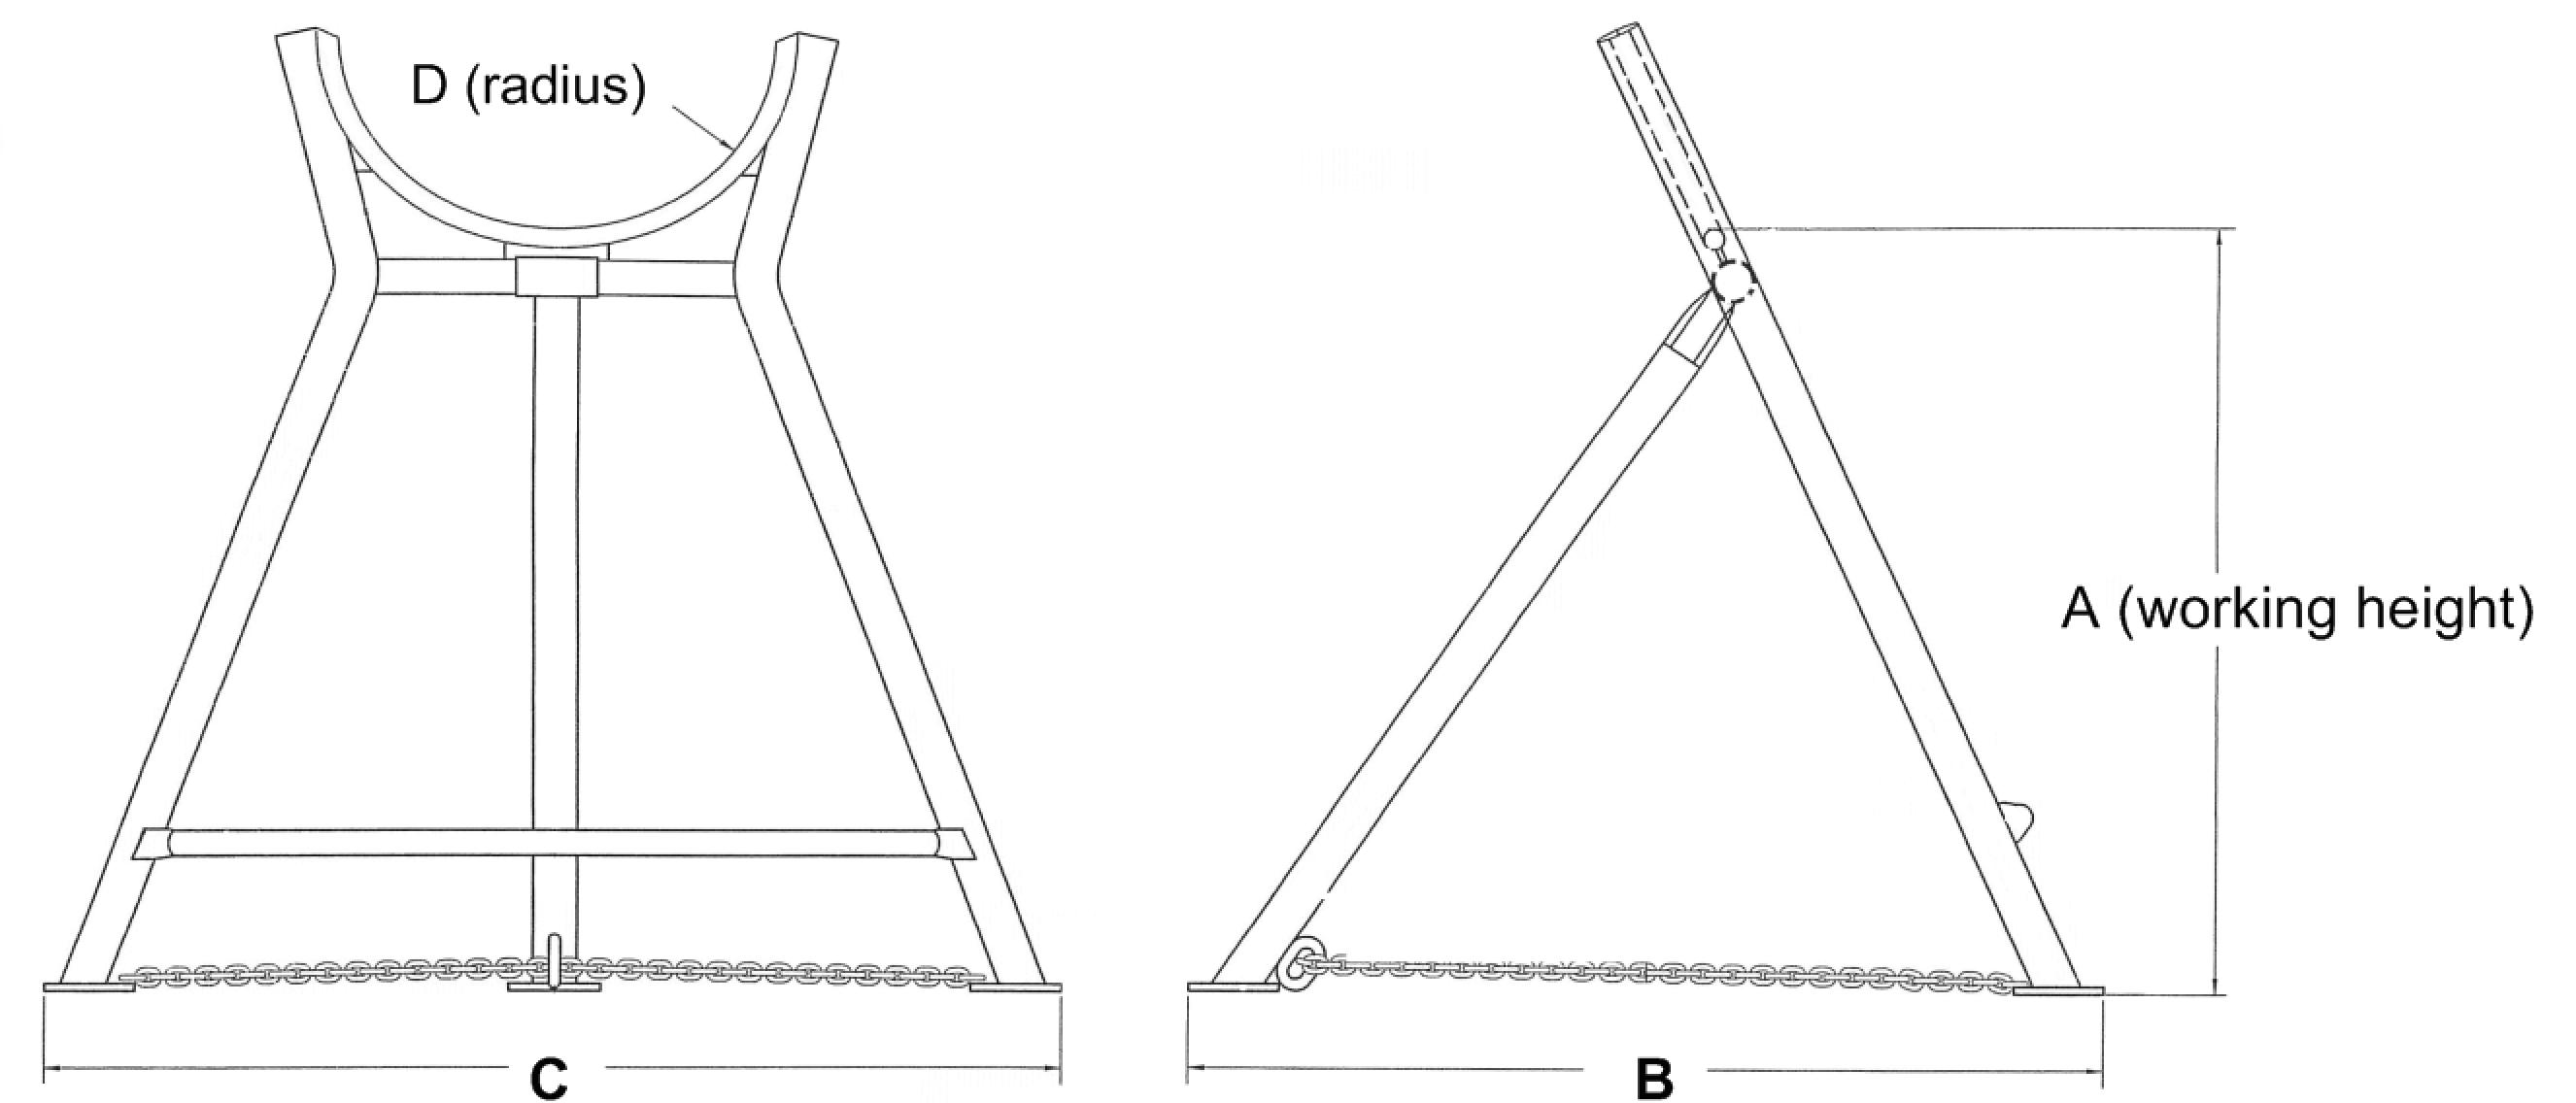 POLE-STAND-CHART